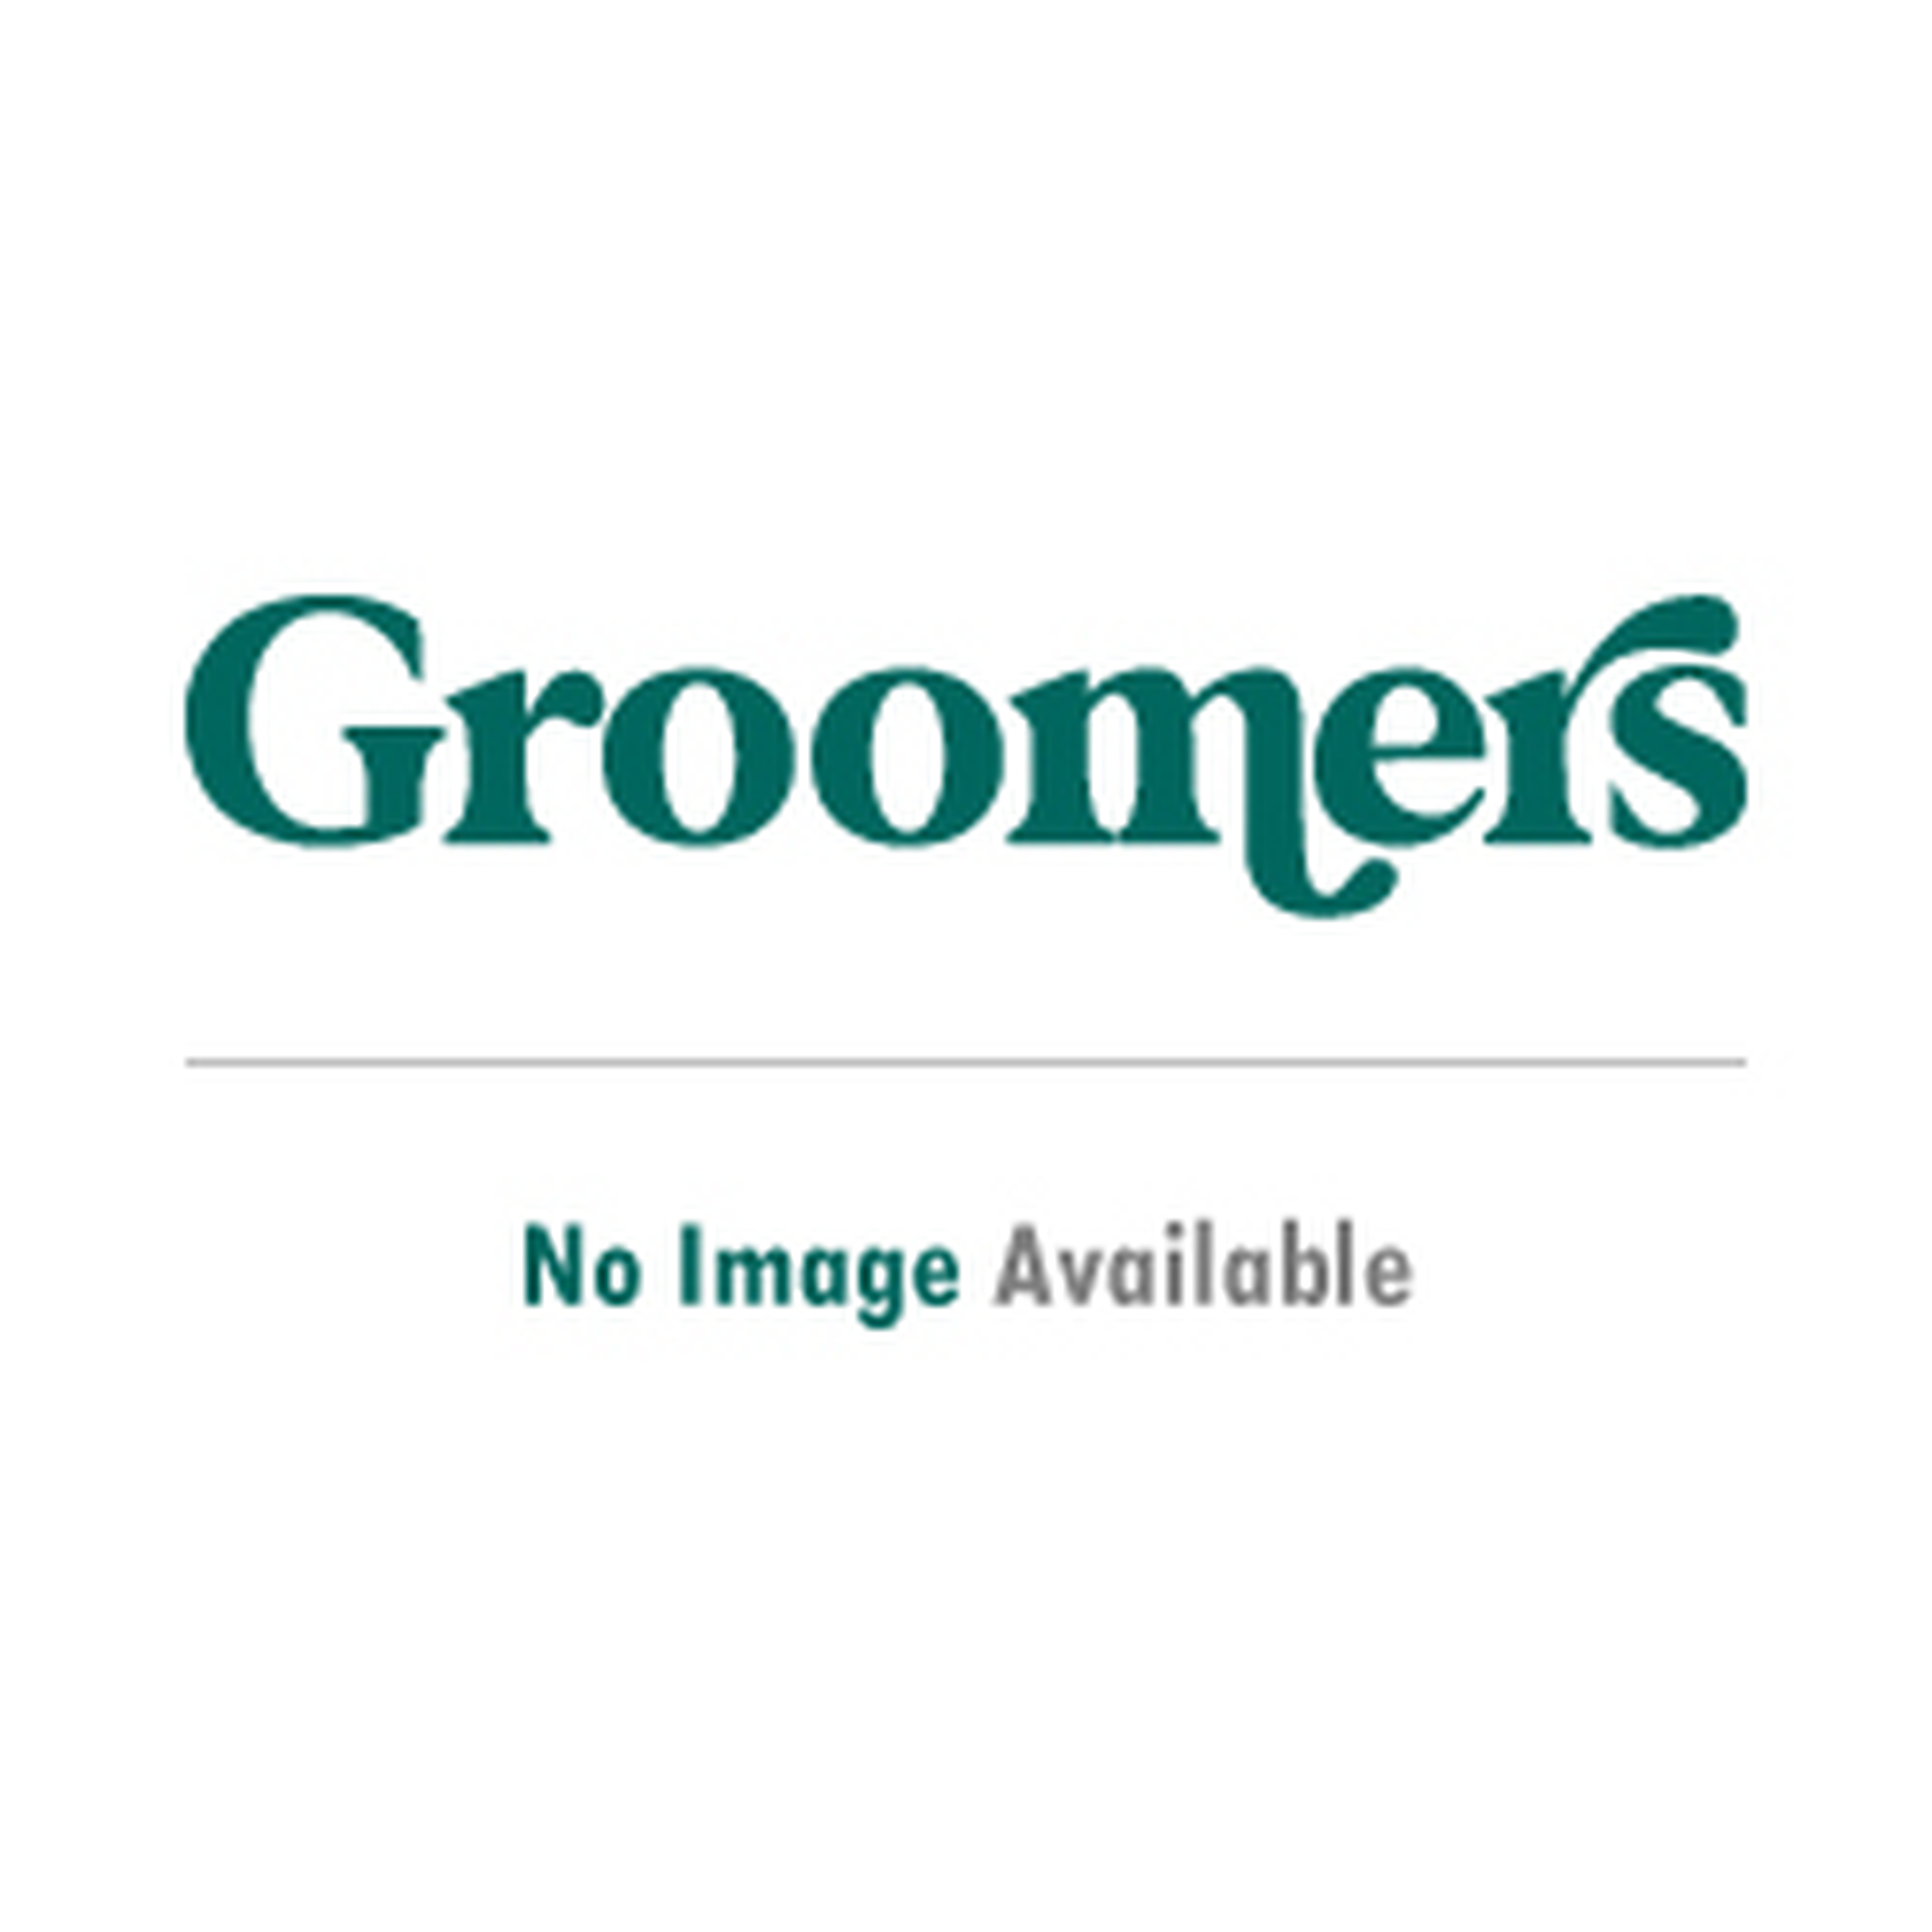 Groomers Performance Soothing Shampoo with Aloe Jojoba - NEW DESIGN